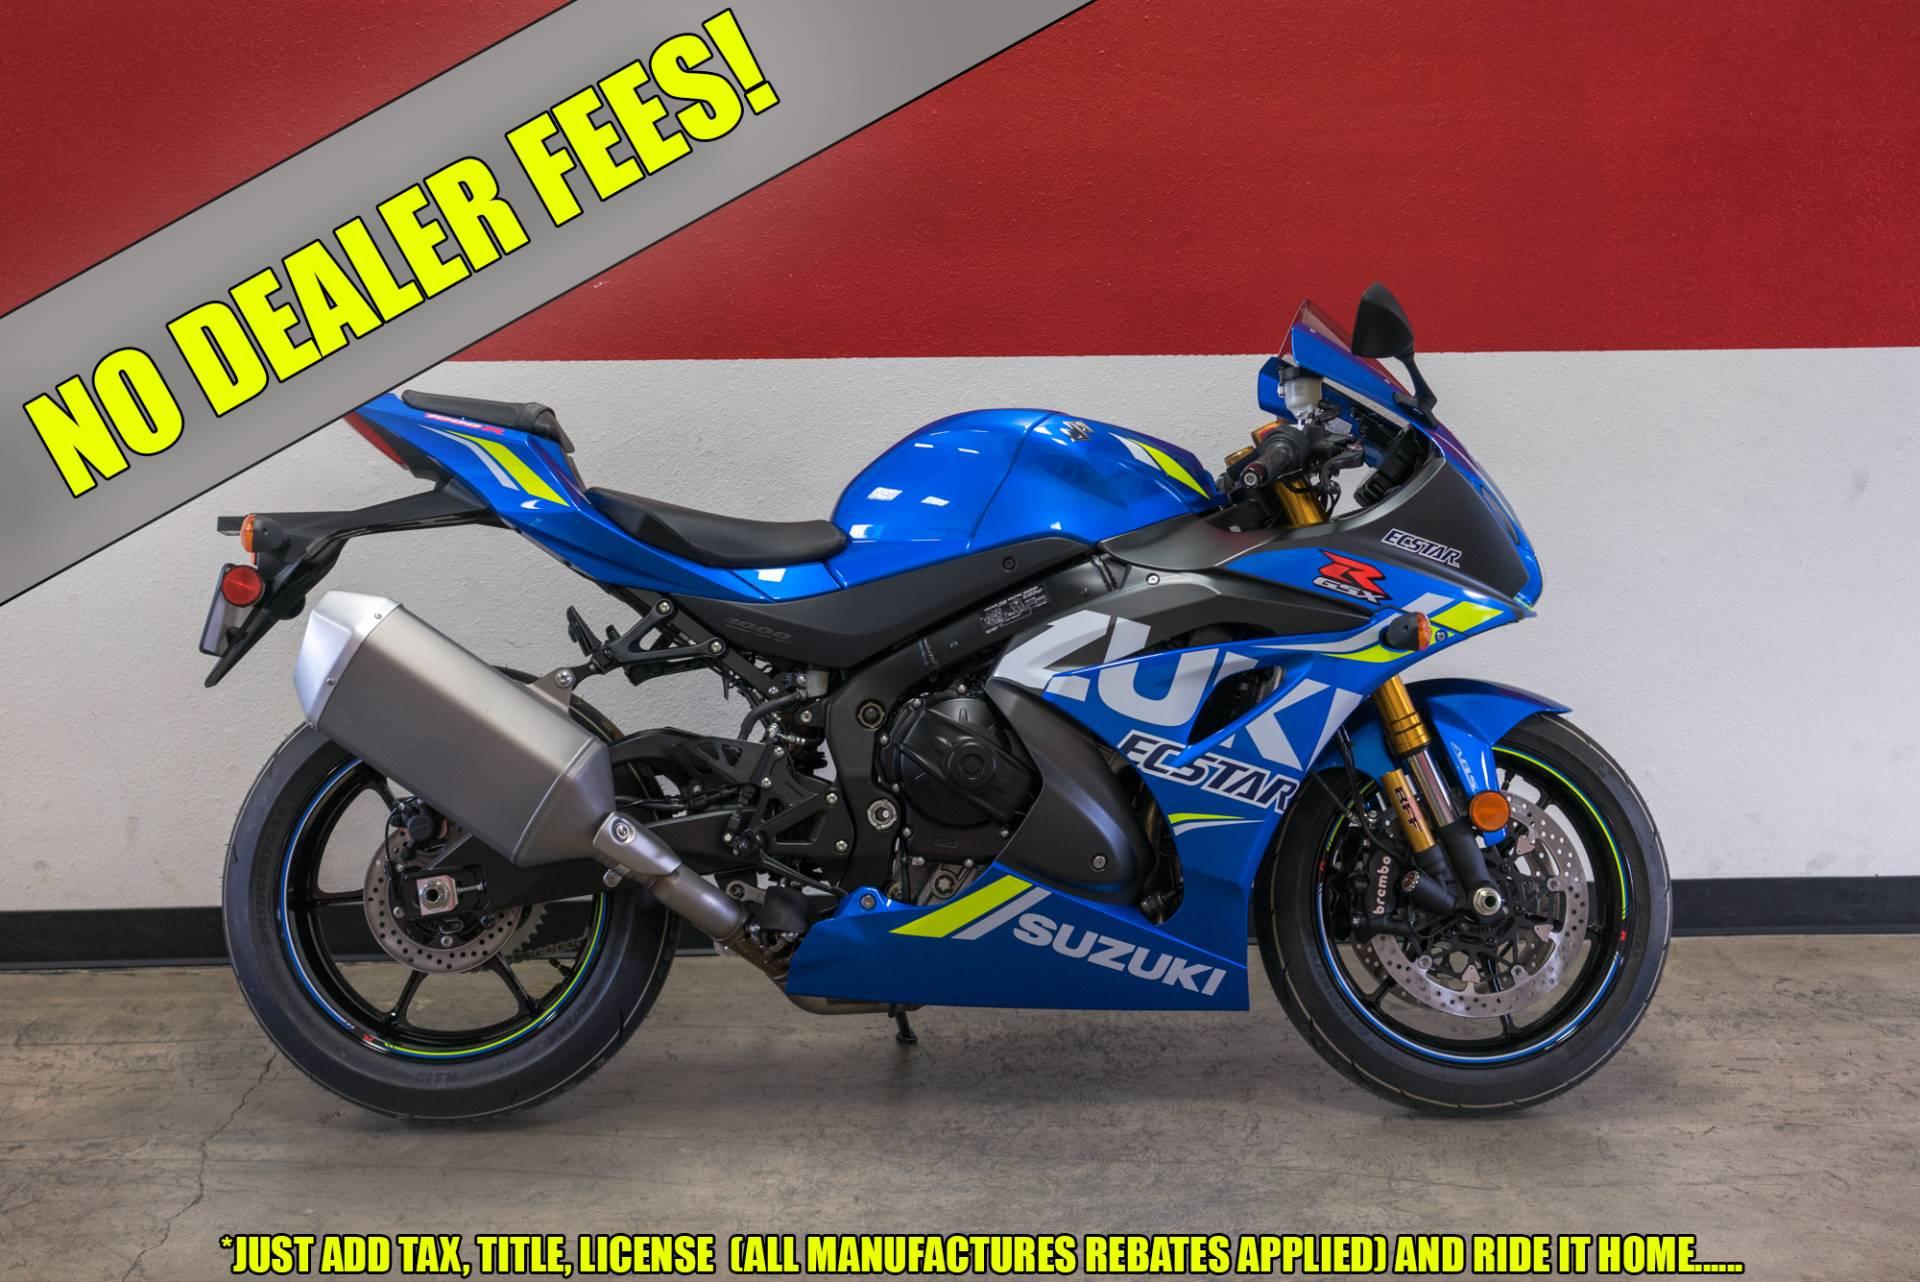 New 2018 suzuki gsx-r1000r motorcycles in brea, ca.